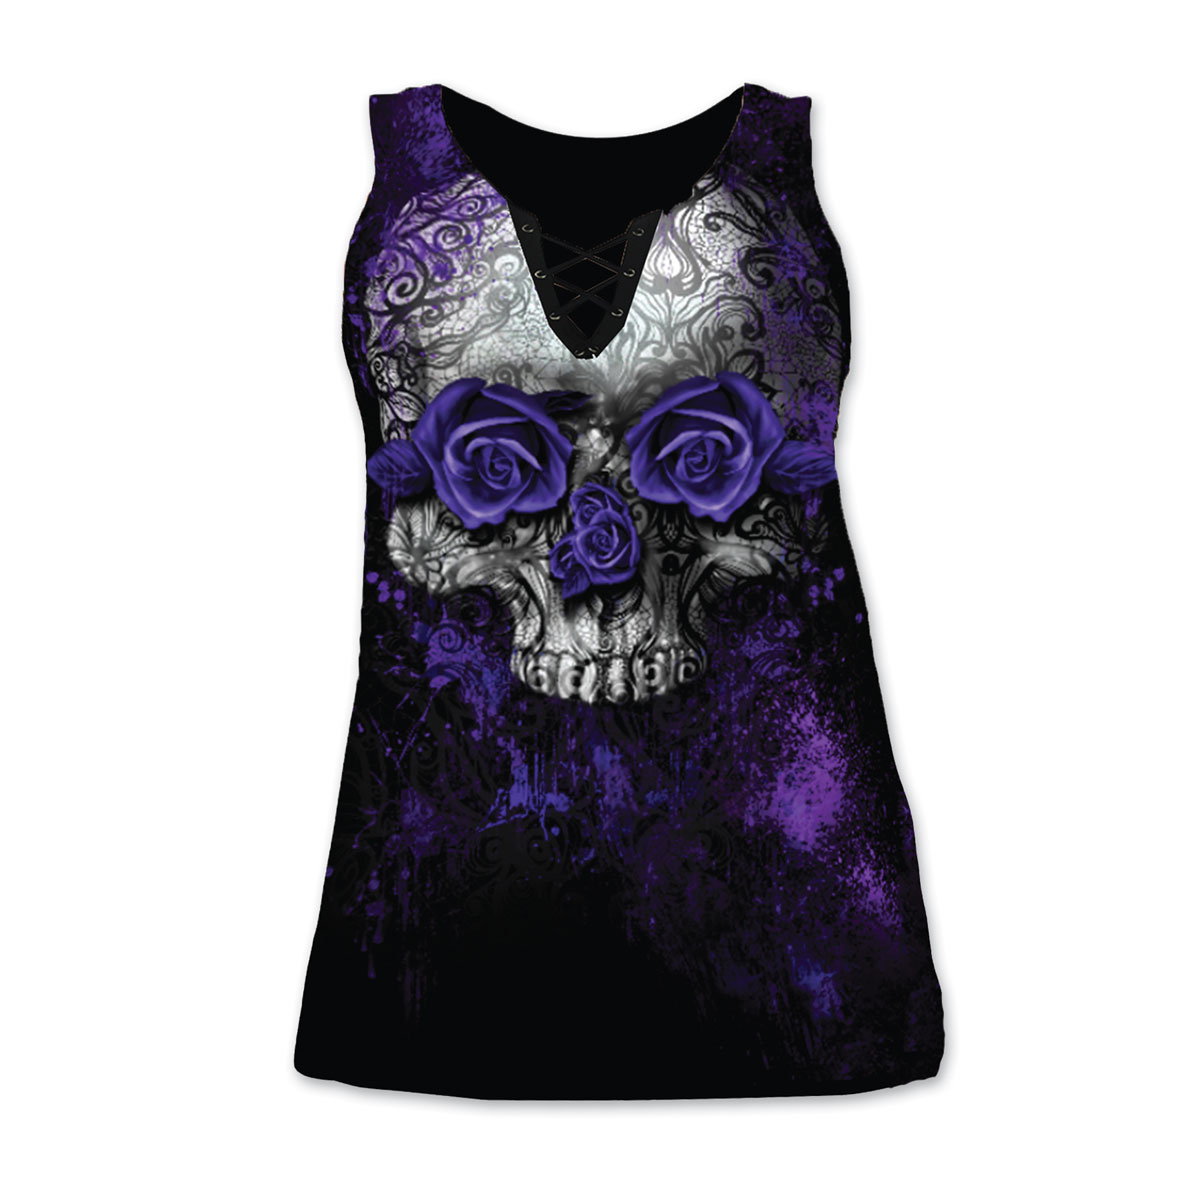 Lethal Angel Women's Purple Rose Skull Curvy Black Tank Top